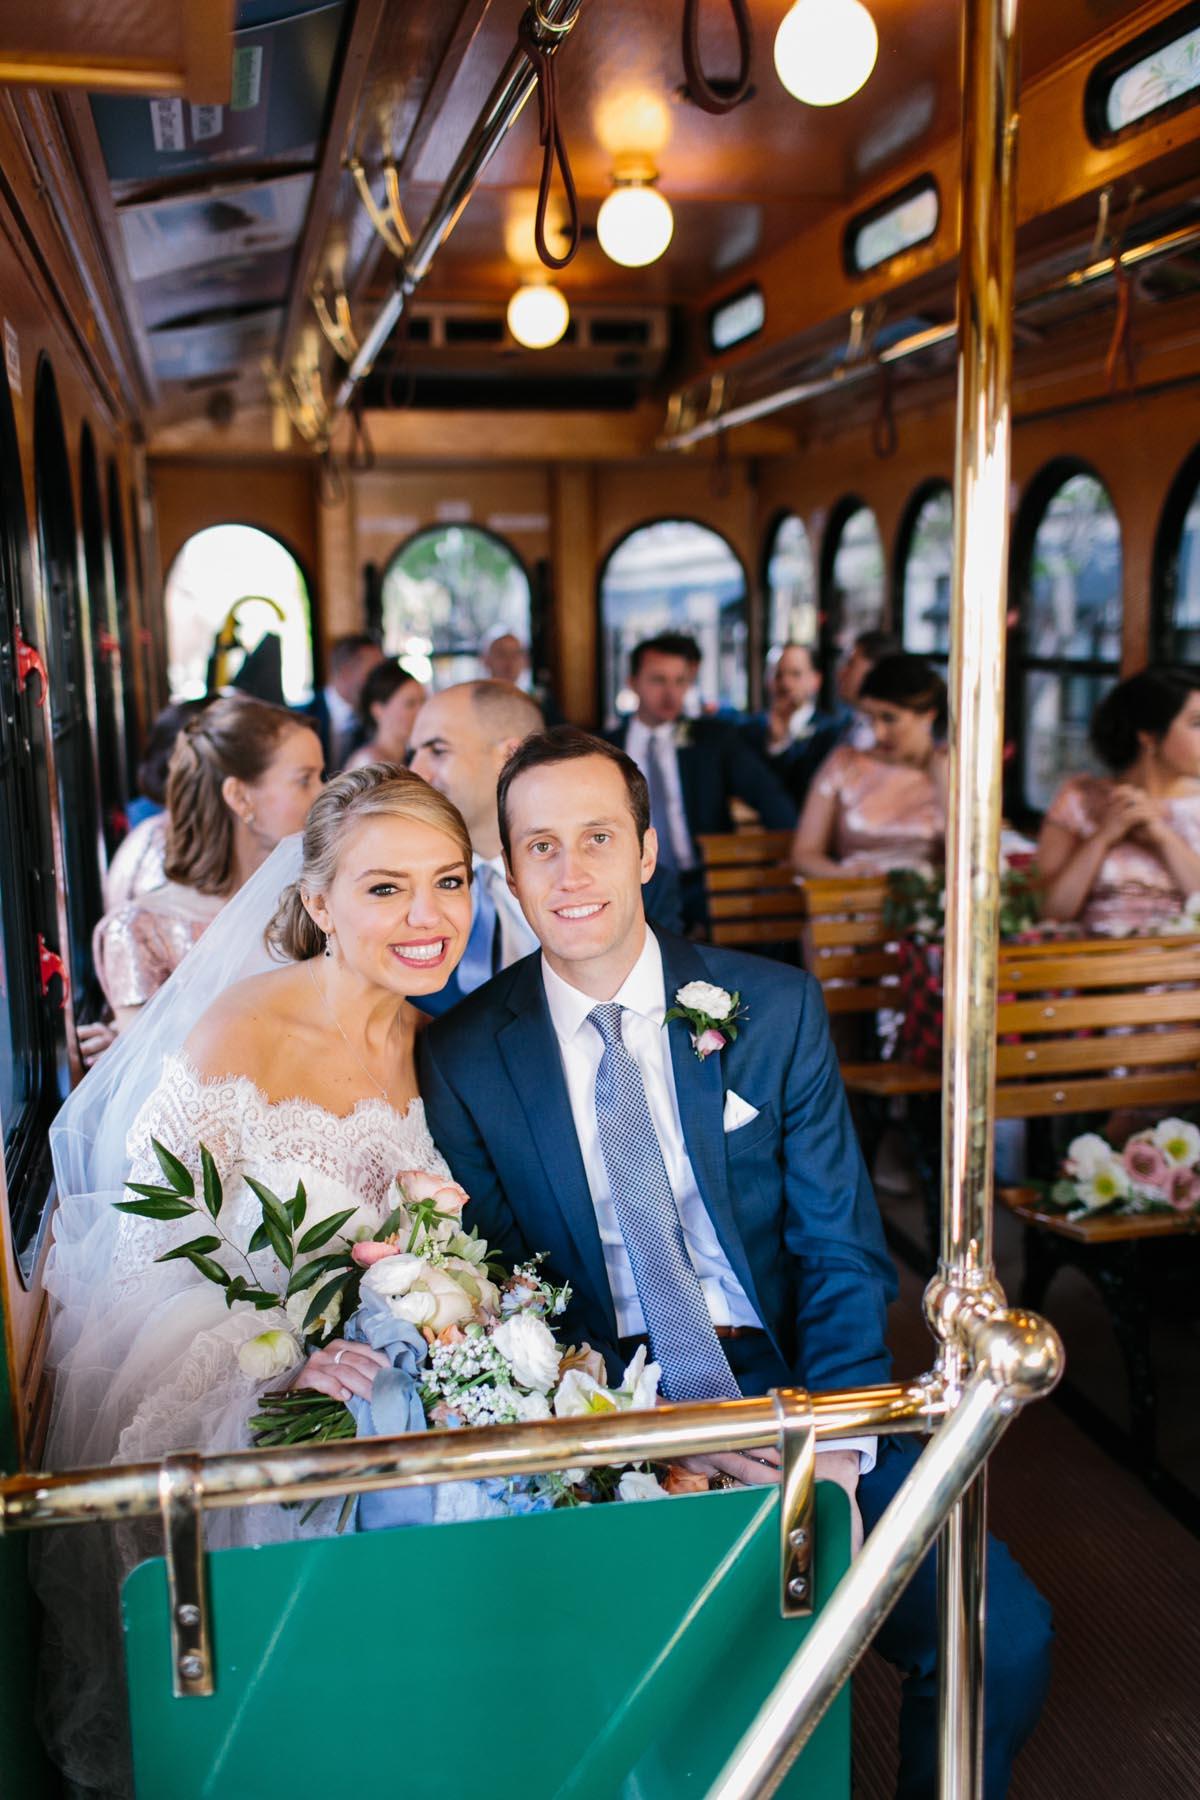 kjellman wedding blog biltmore wedding -58